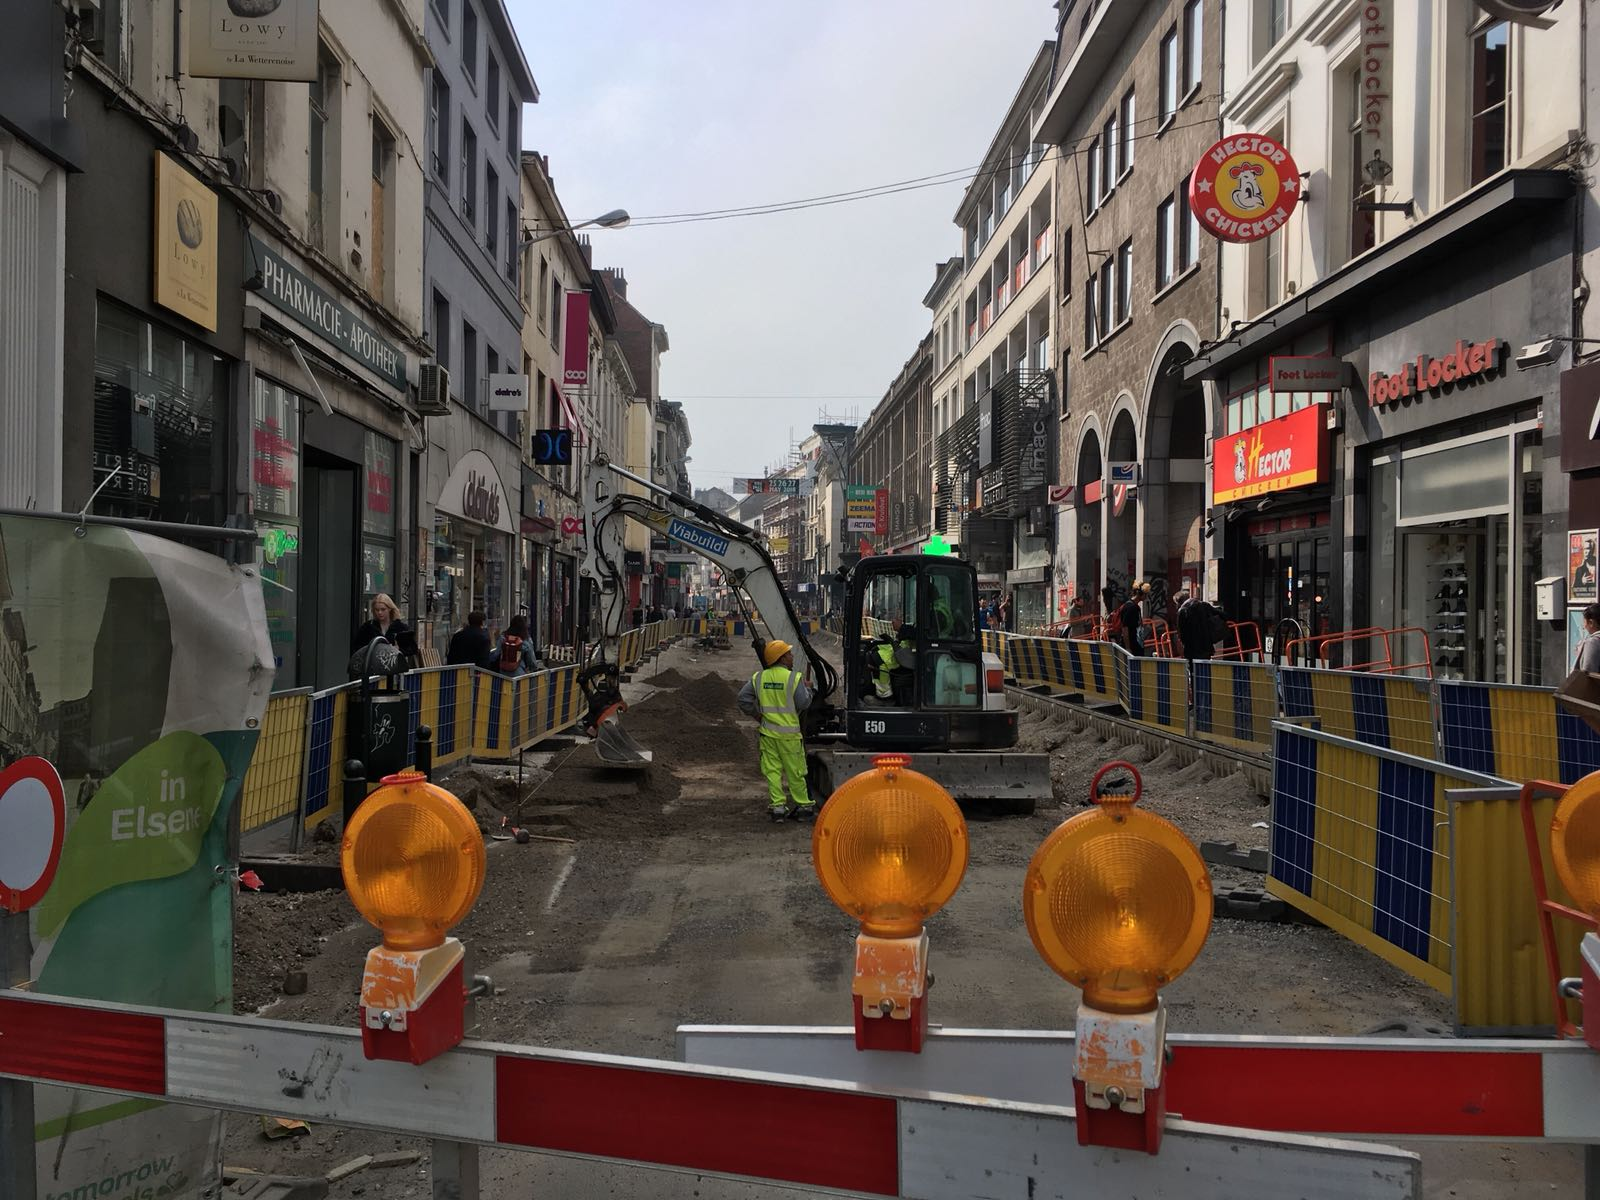 Chaussée d'Ixelles 16